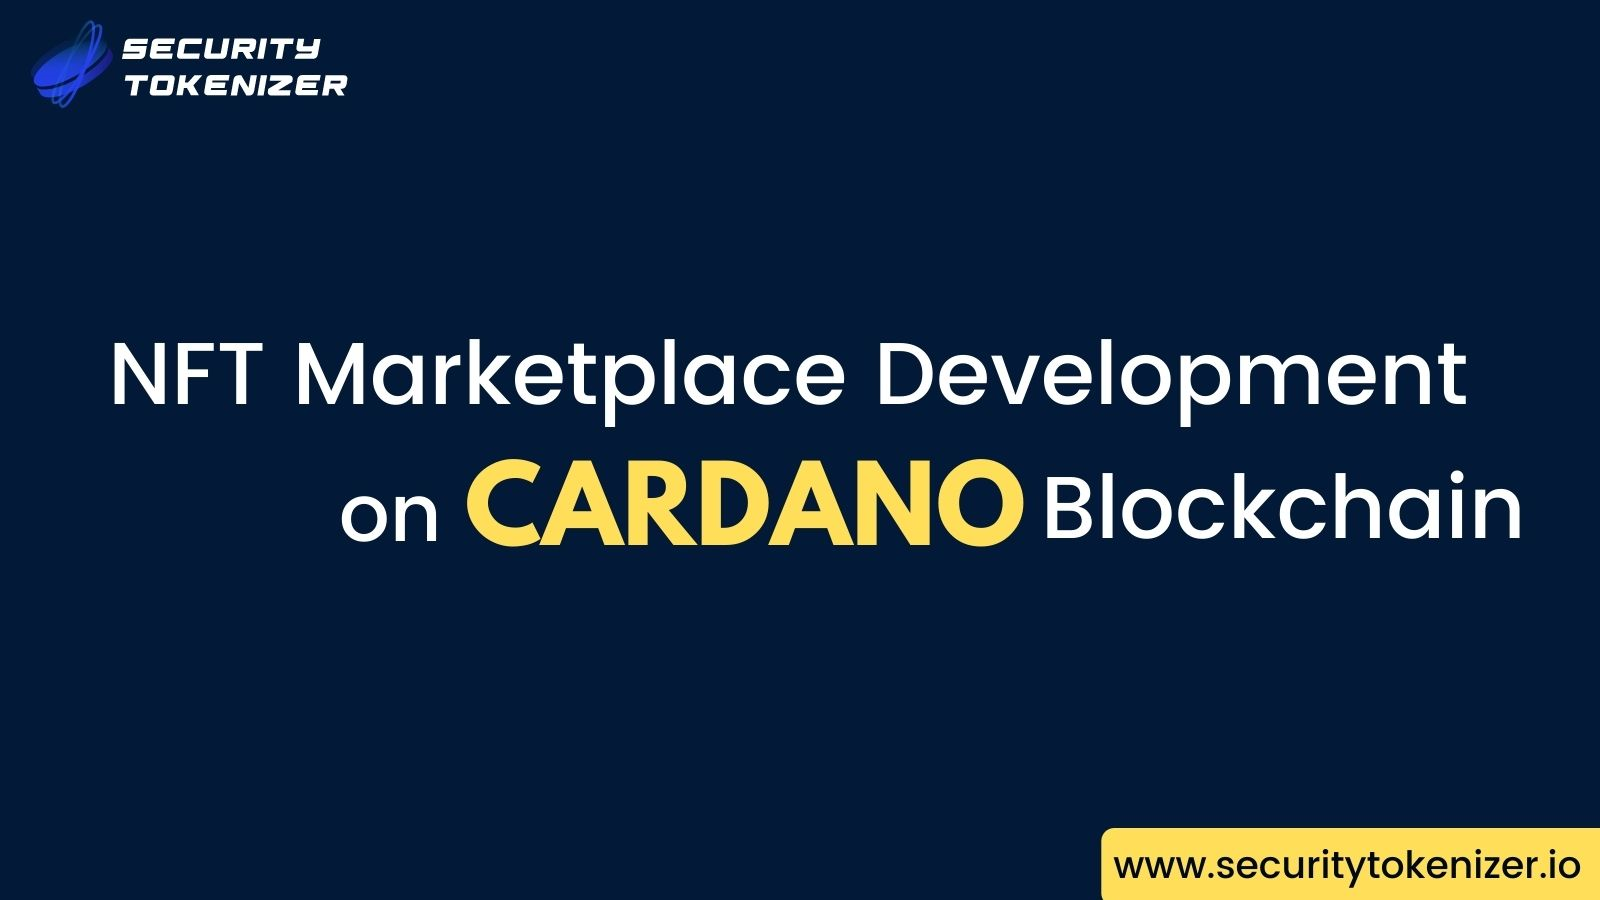 Cardano NFT Marketplace Development Company   NFT Marketplace Development on Cardano